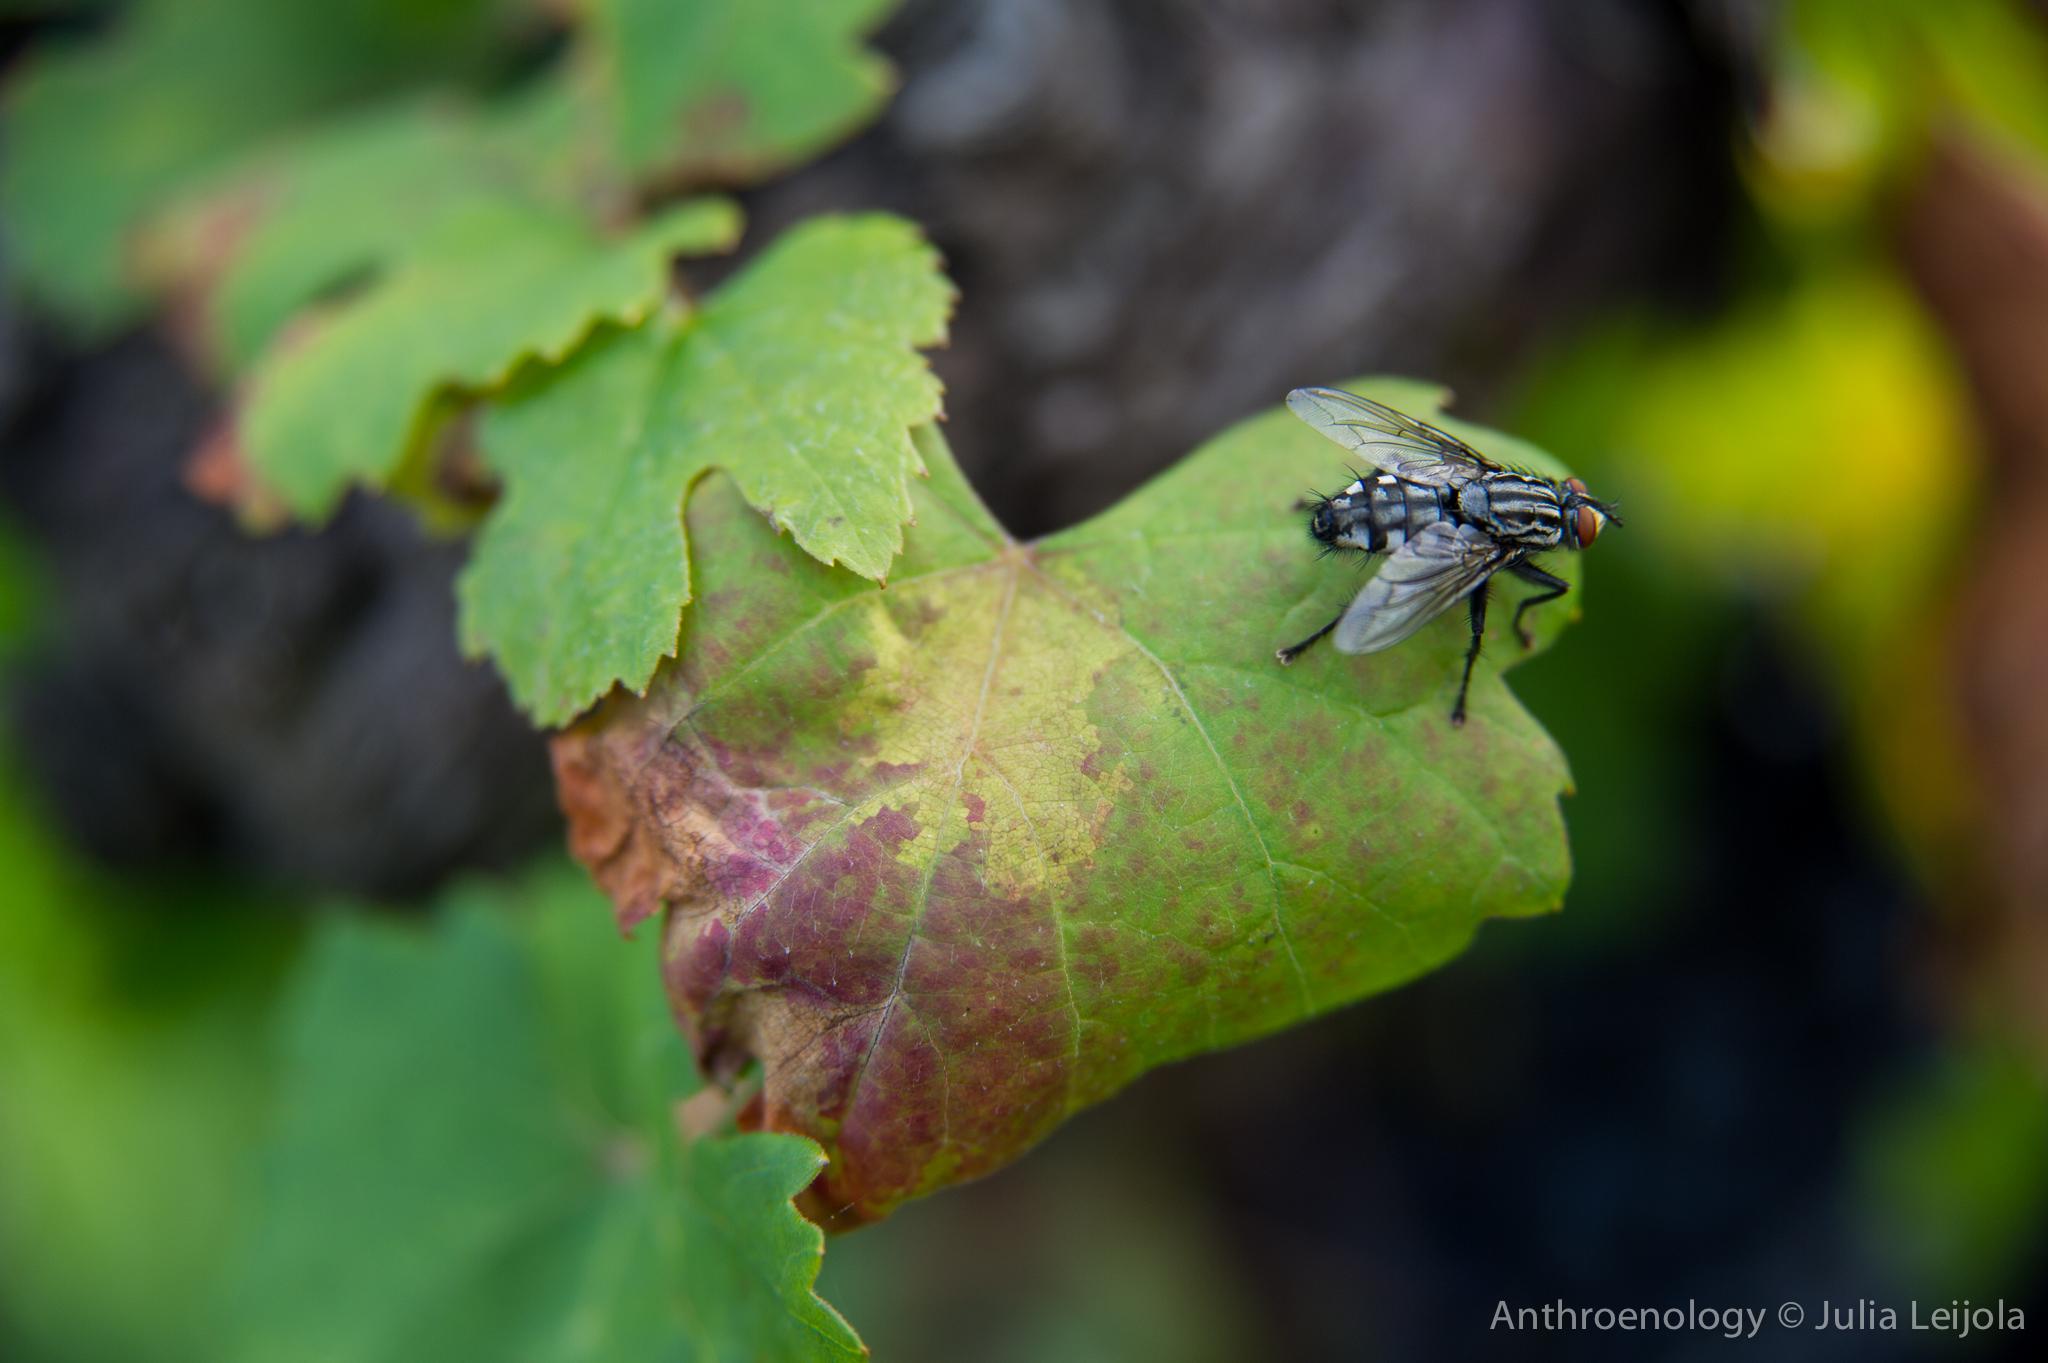 Fly on a grape leaf.